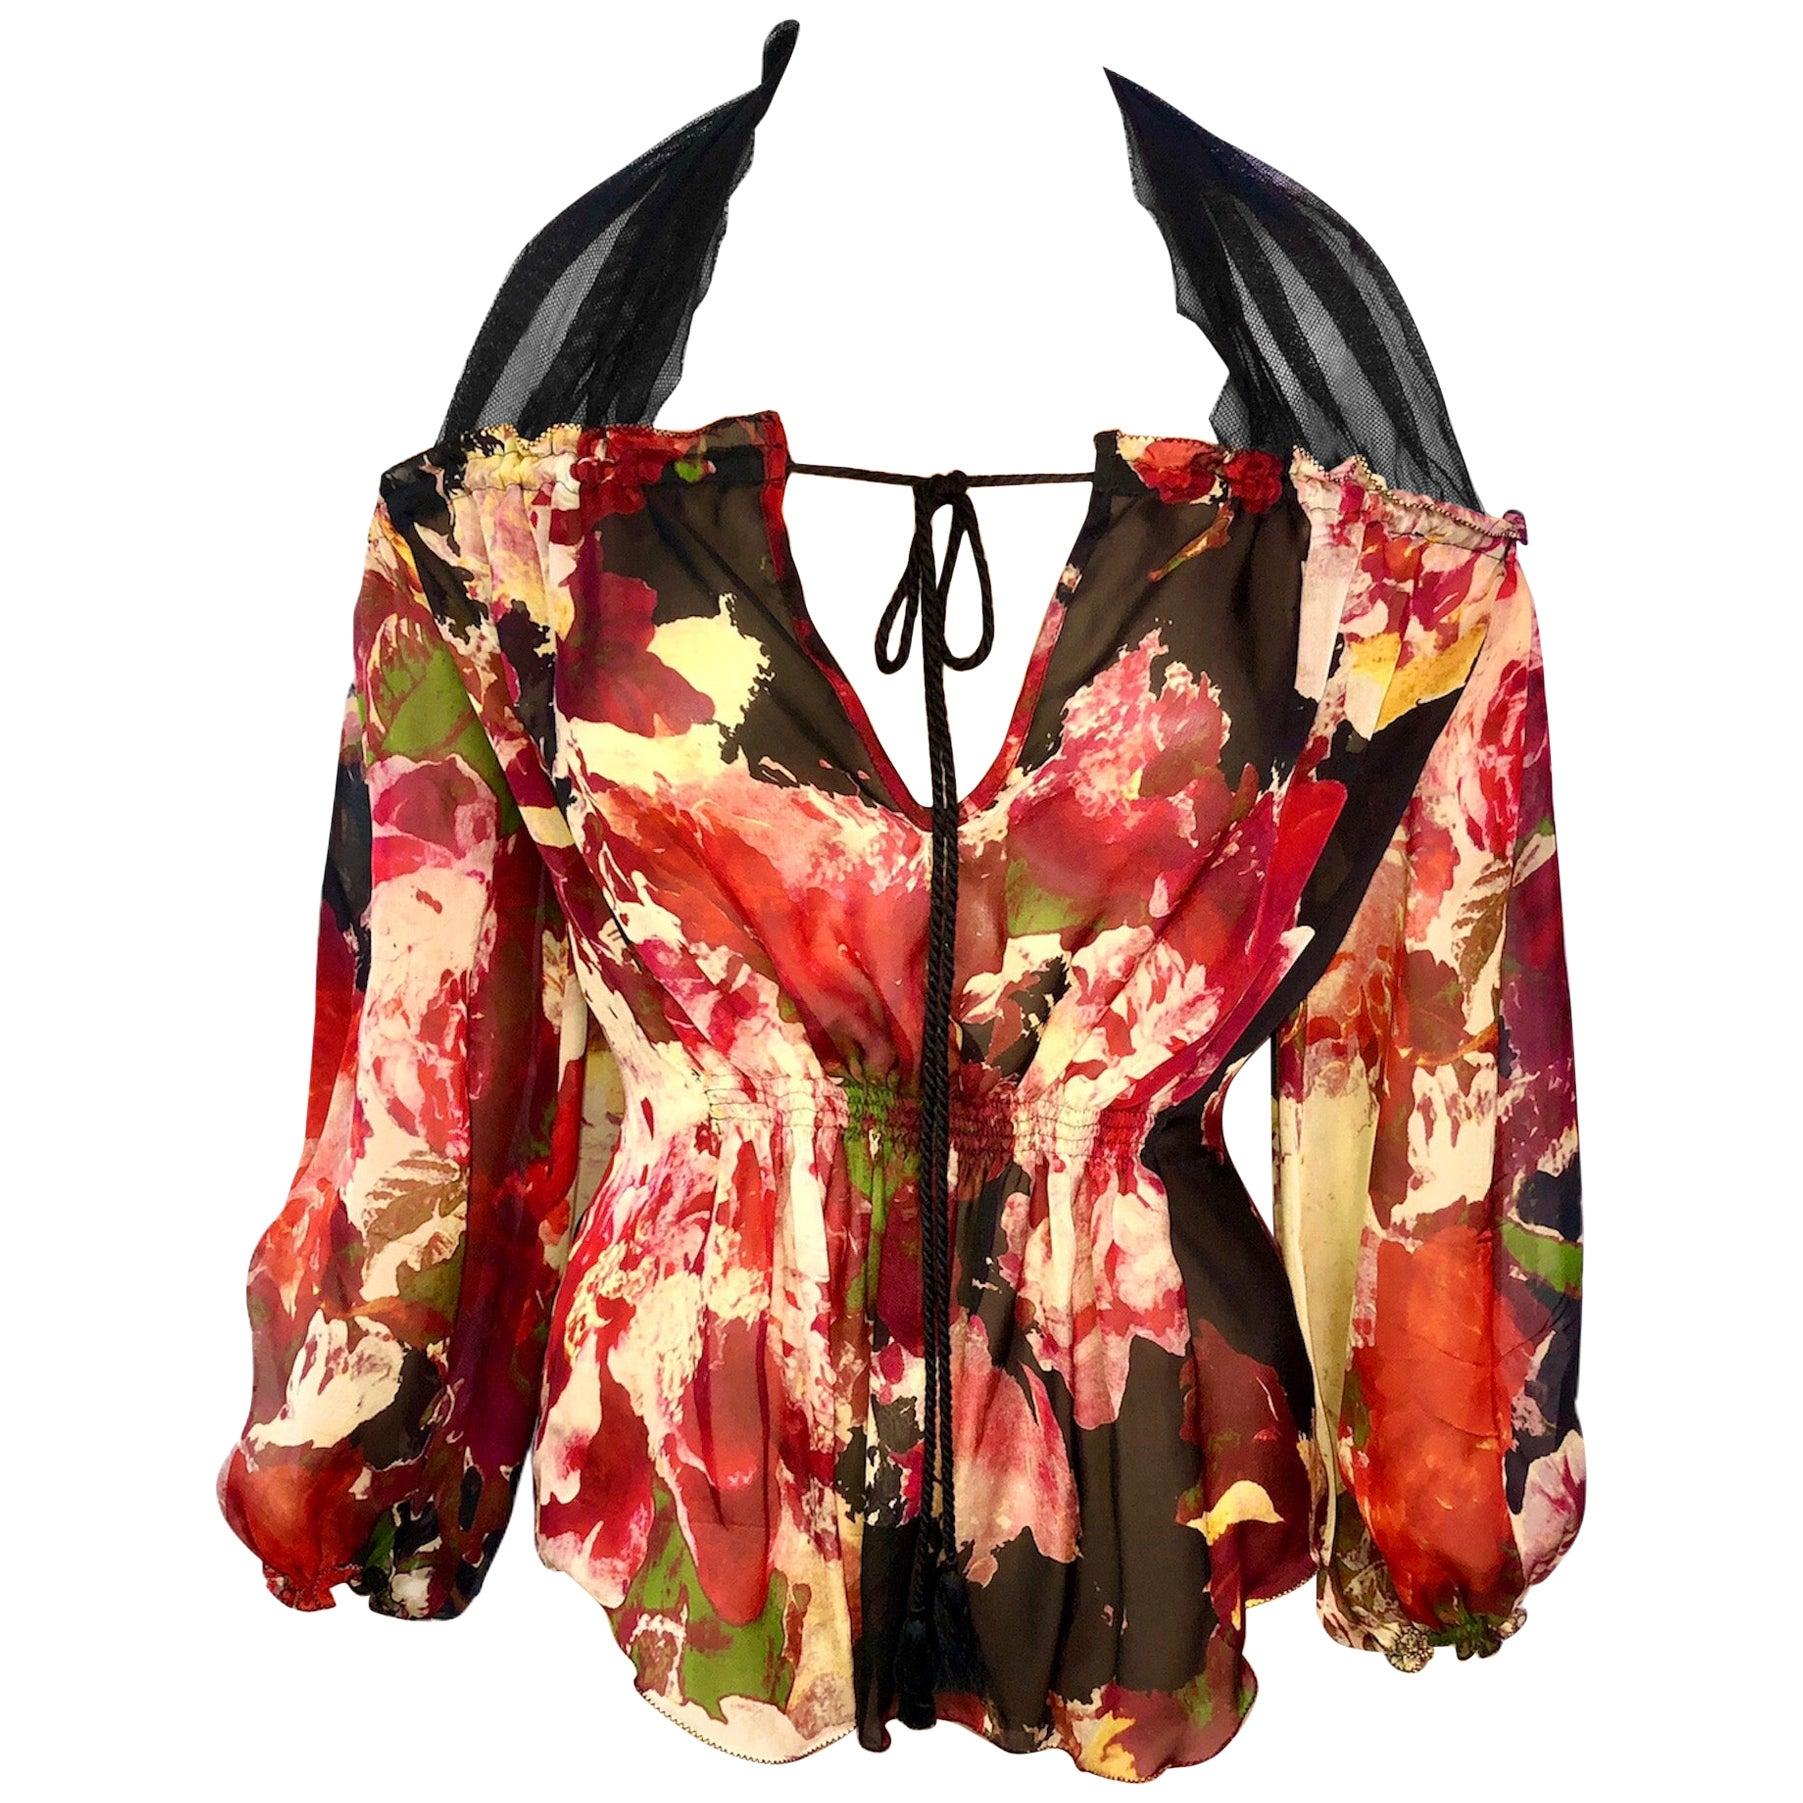 Jean Paul Gaultier Floral Print Semi-Sheer Silk Blouse Top